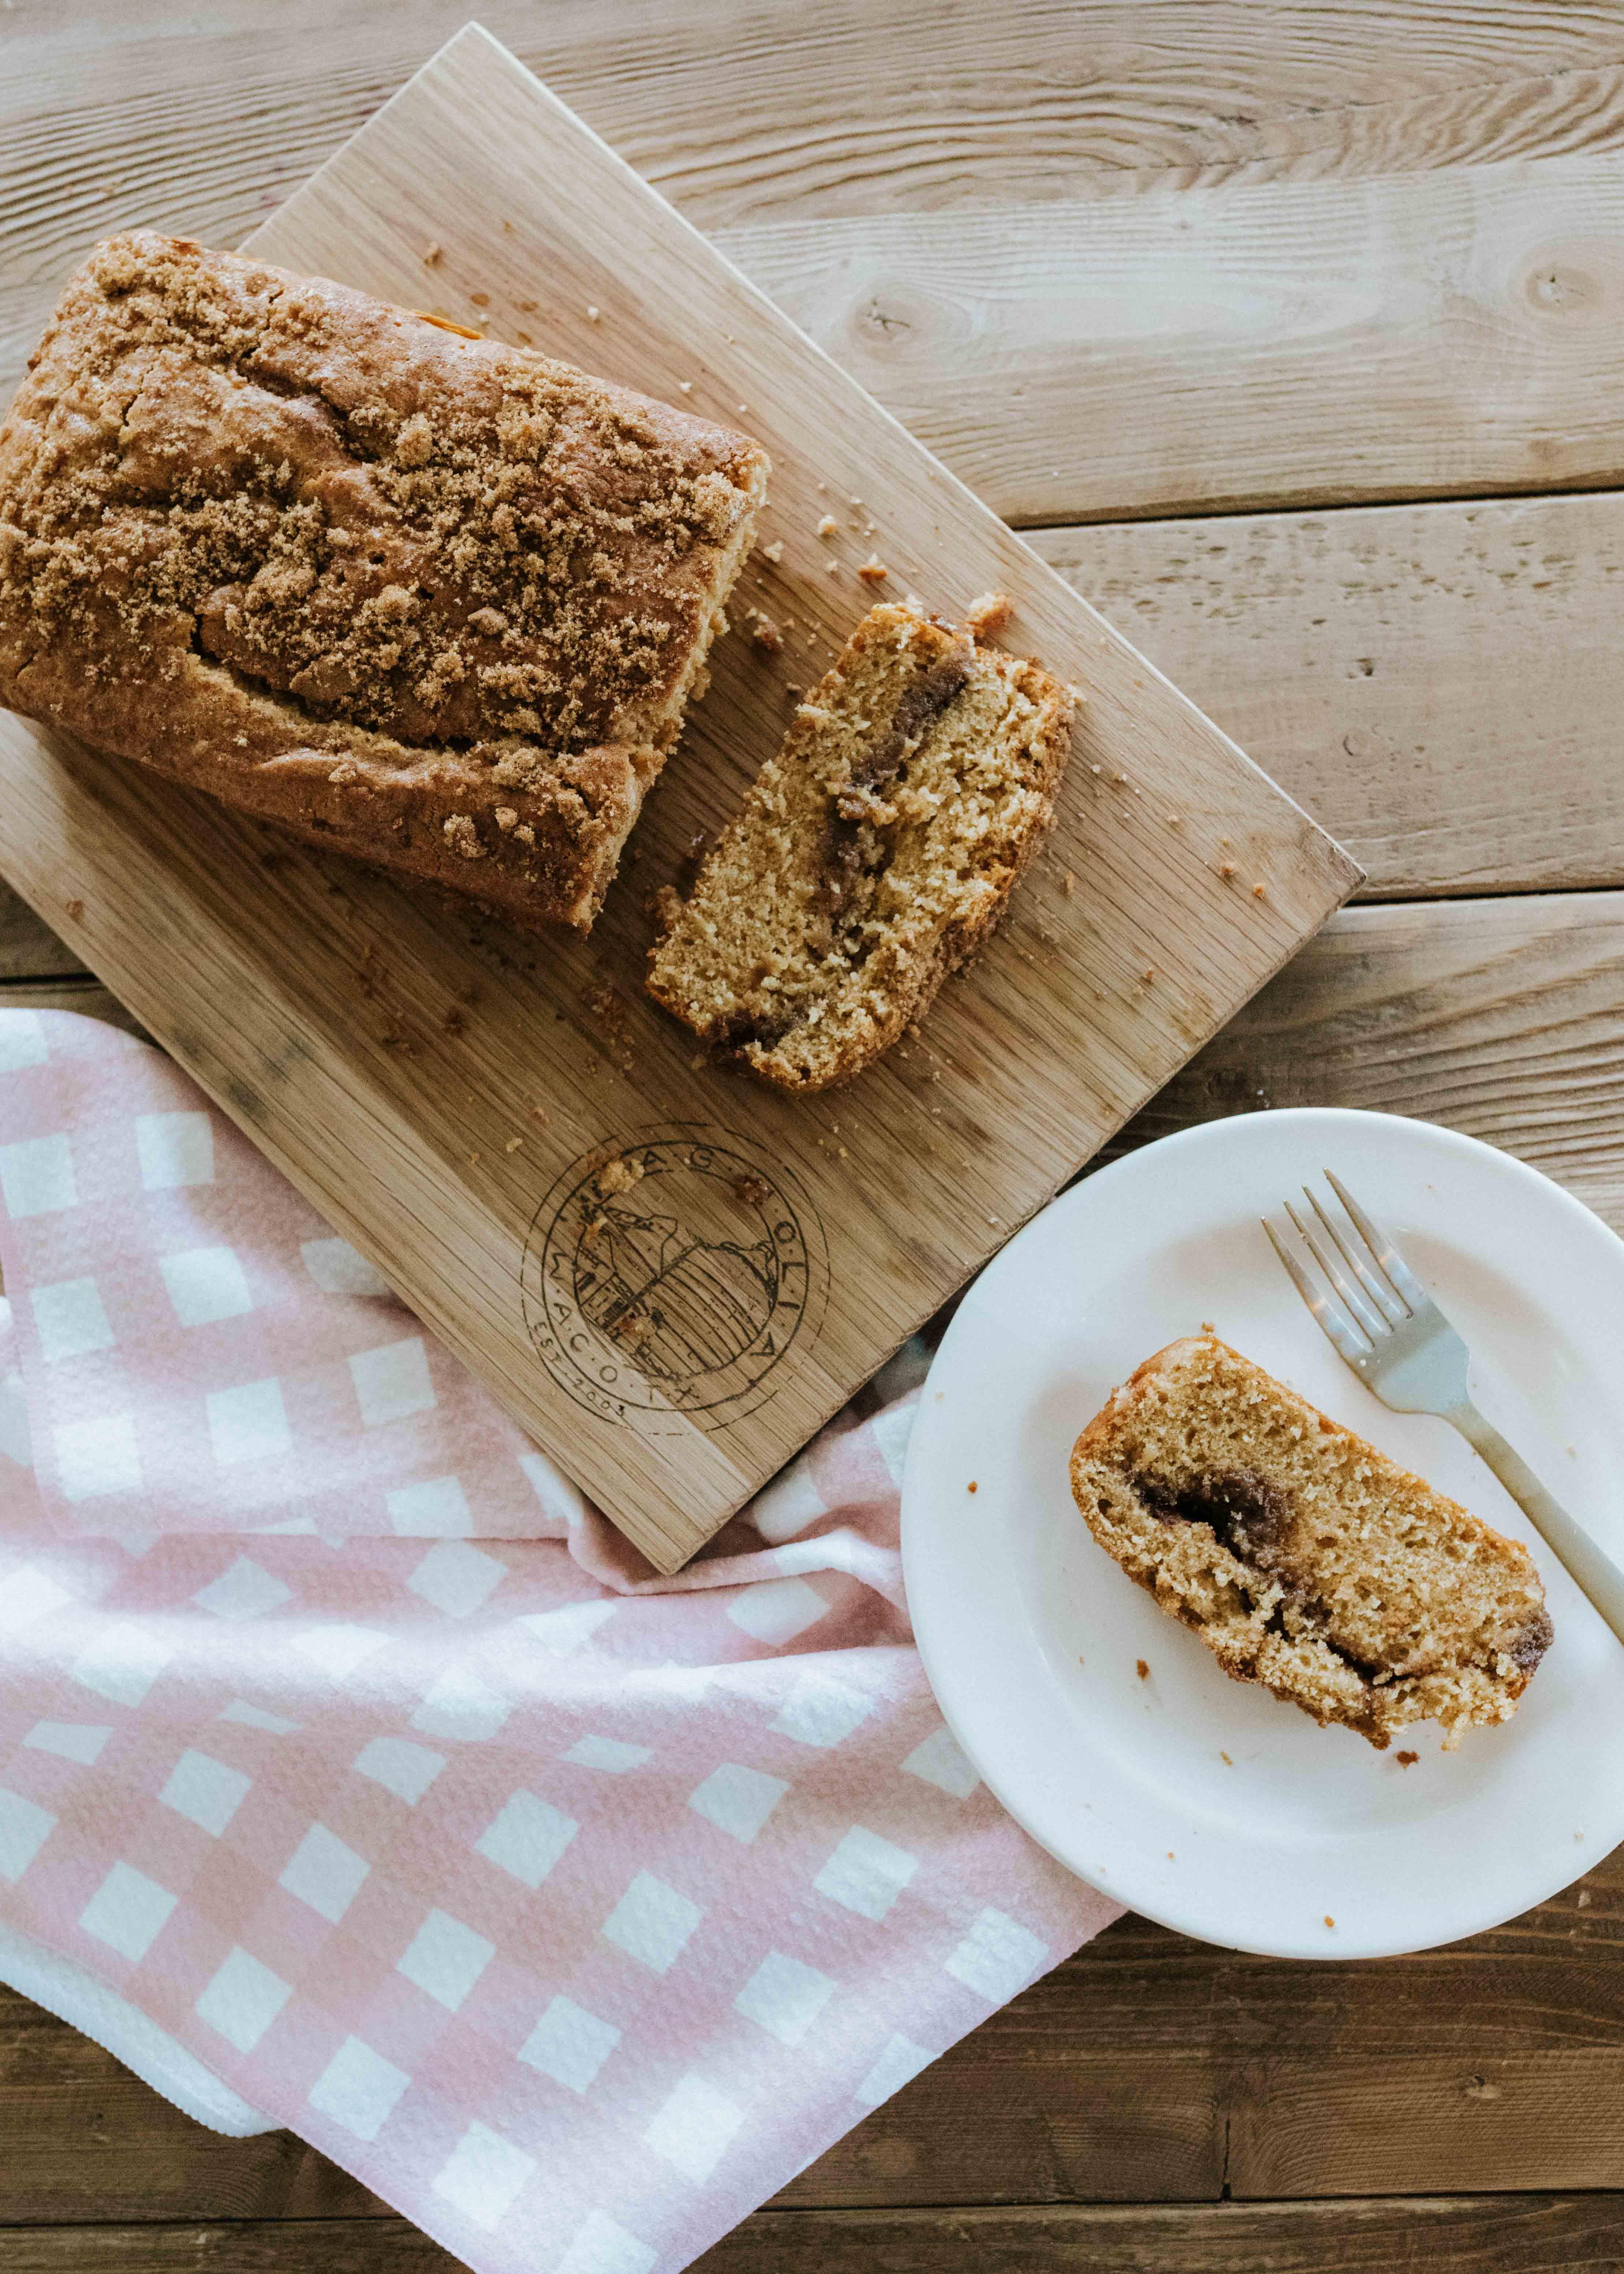 Cinnamon Swirl Breakfast Loaf: moist and flavorful cinnamon bread with a swirl of cinnamon sugar. #cakebycourtney #cake #breakfastcake #breadrecipe #cinnamonbreadrecipe #cinnamonbread #bread #loaf